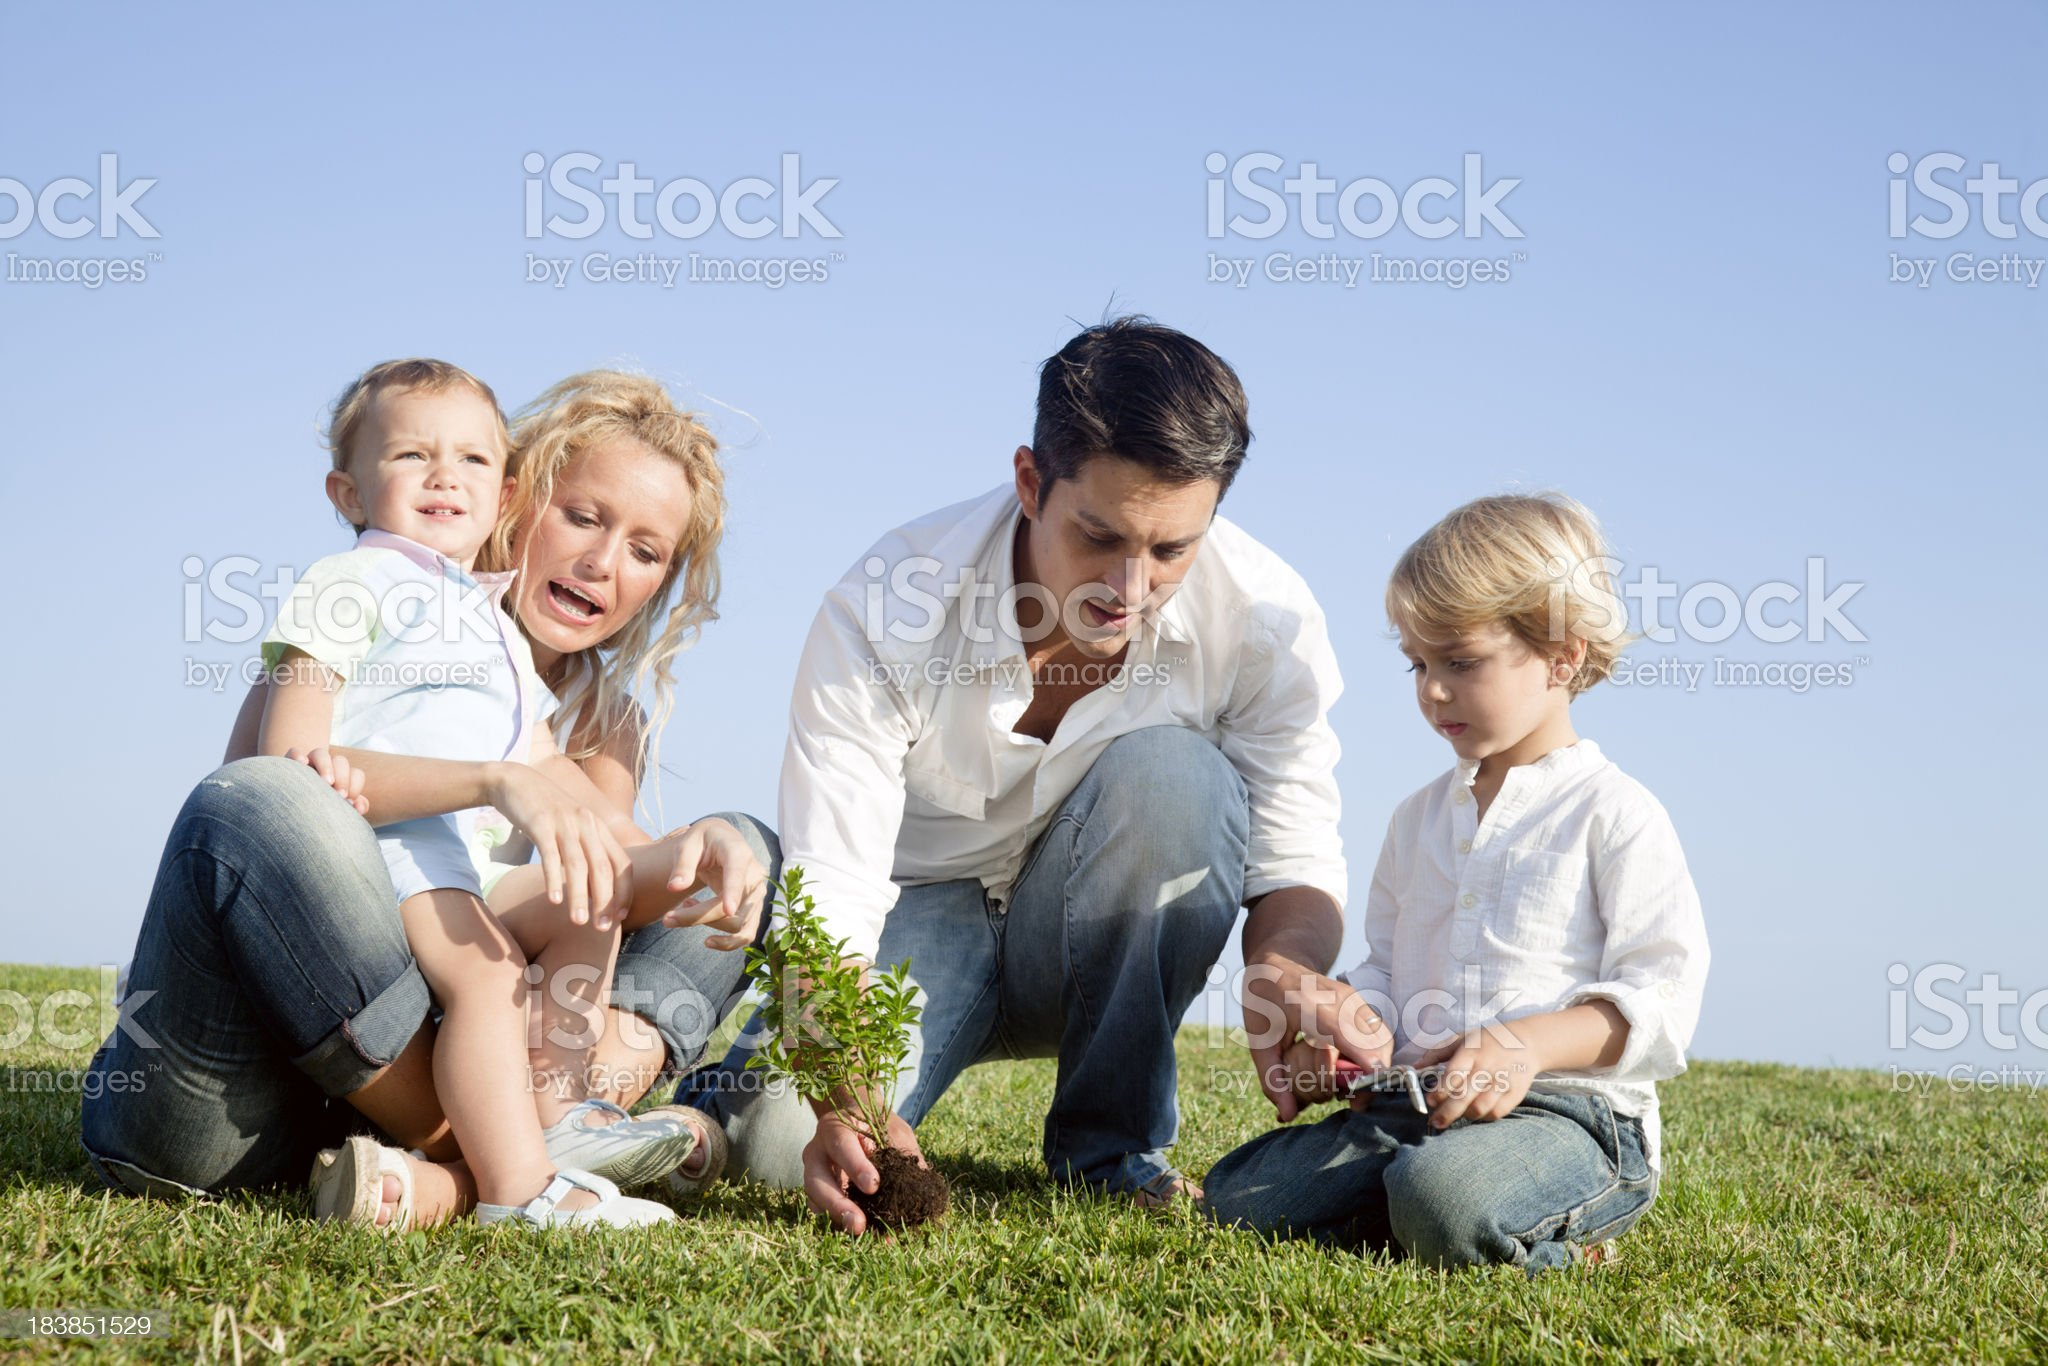 Family planting a tree royalty-free stock photo